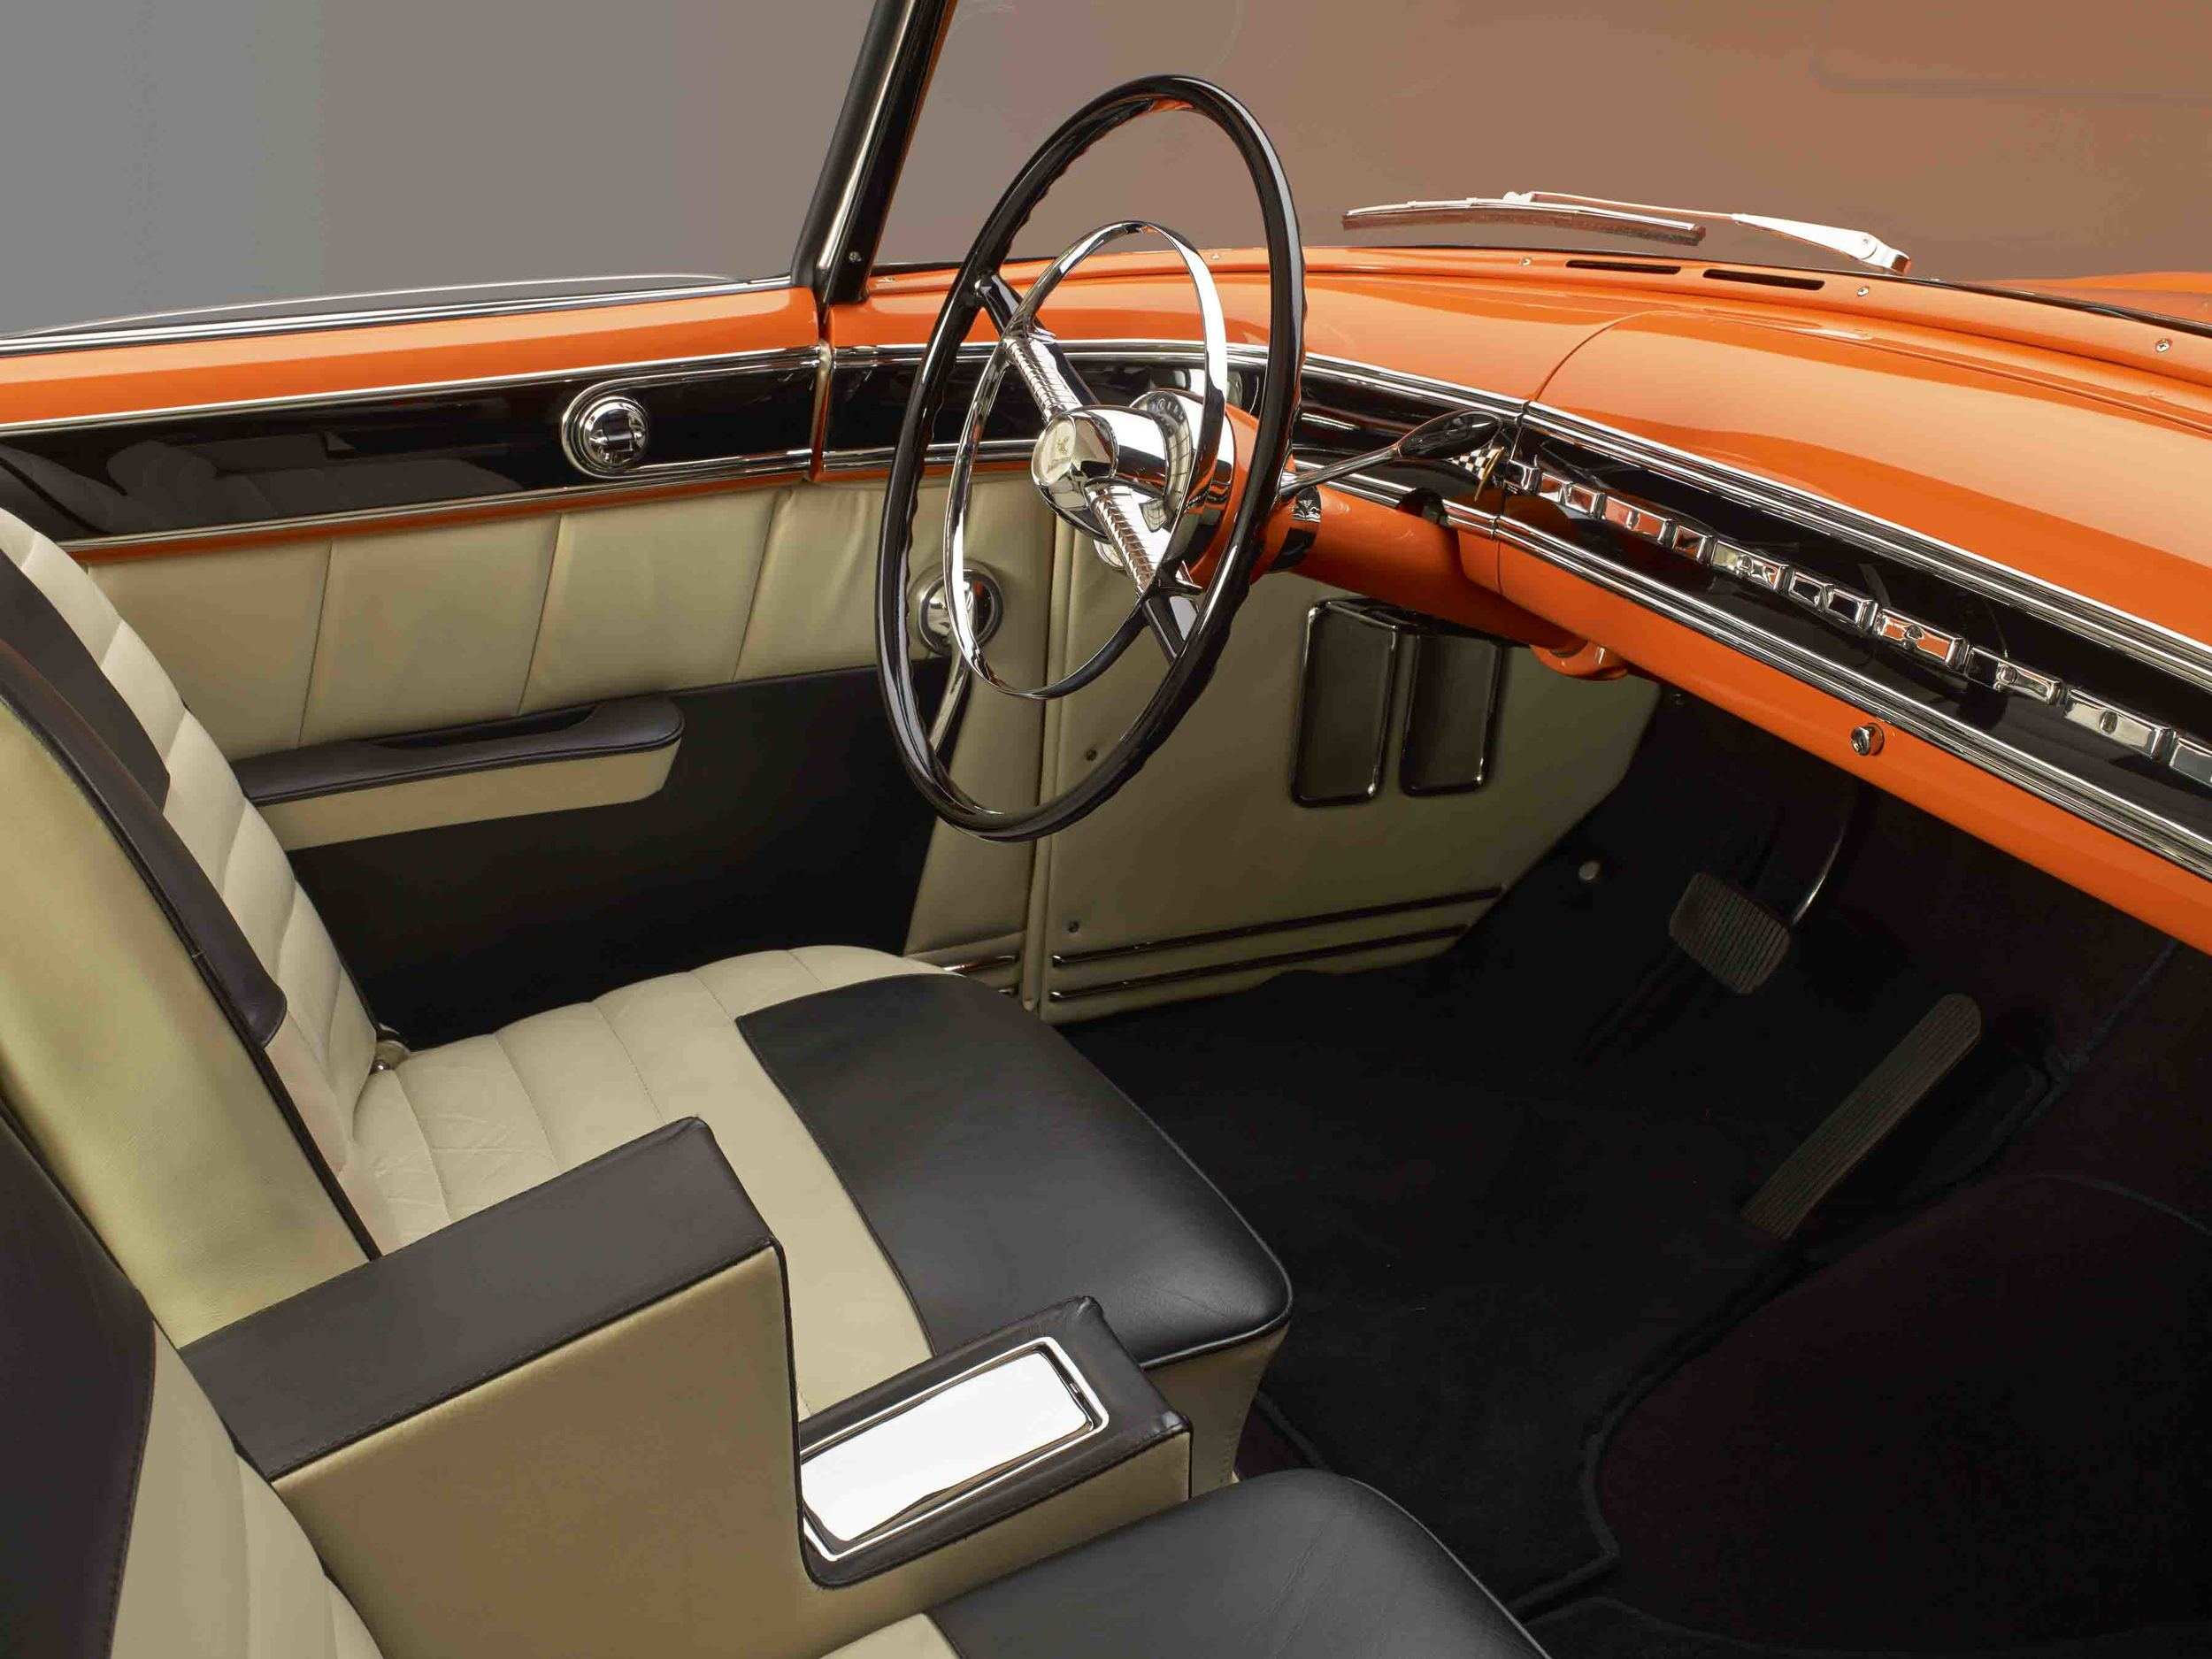 "NY13_r107_04 img alt=""lincoln indianapolis executive study the car crush"".jpg"